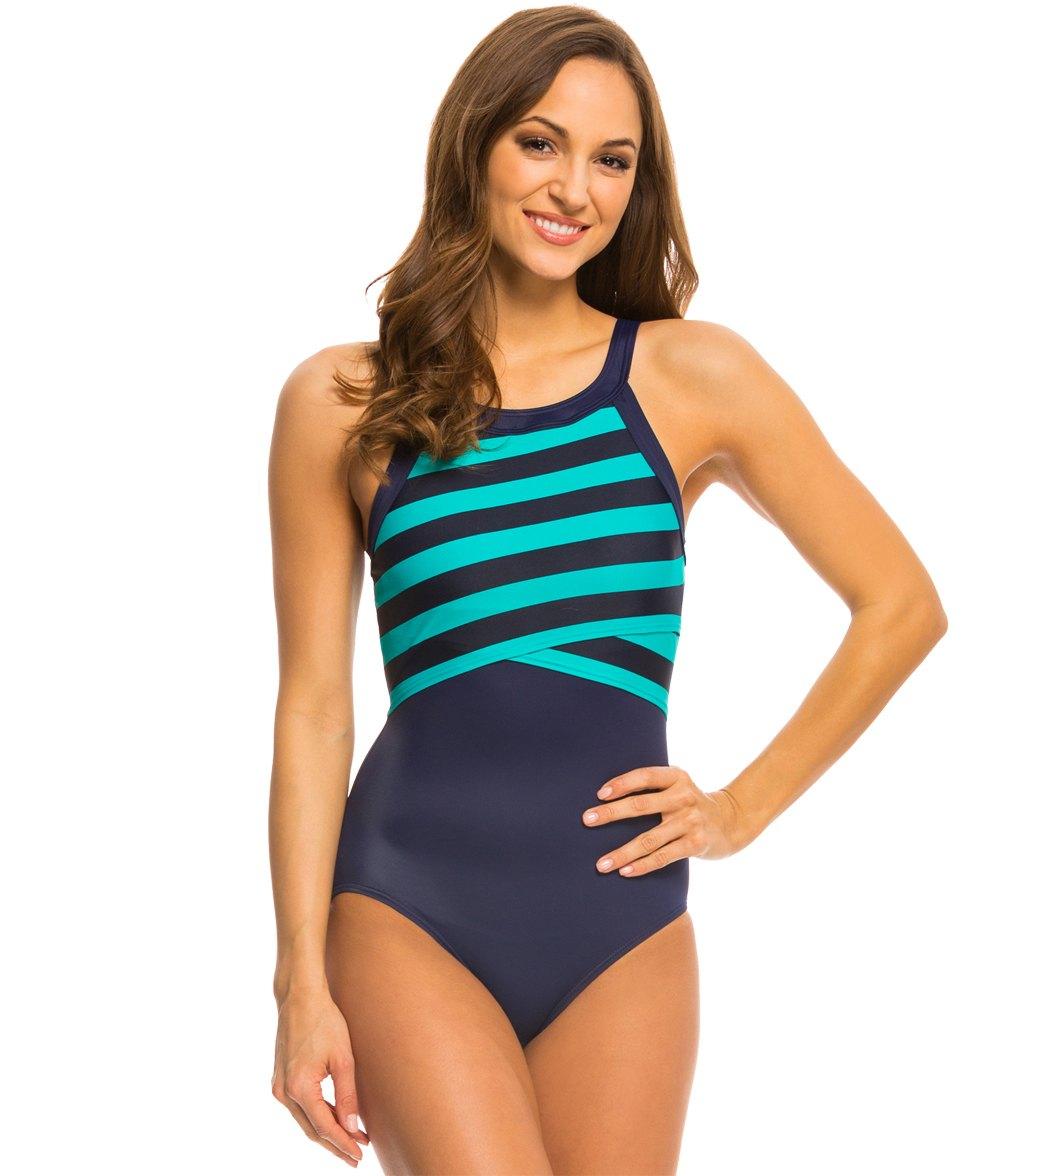 dkny swimwear